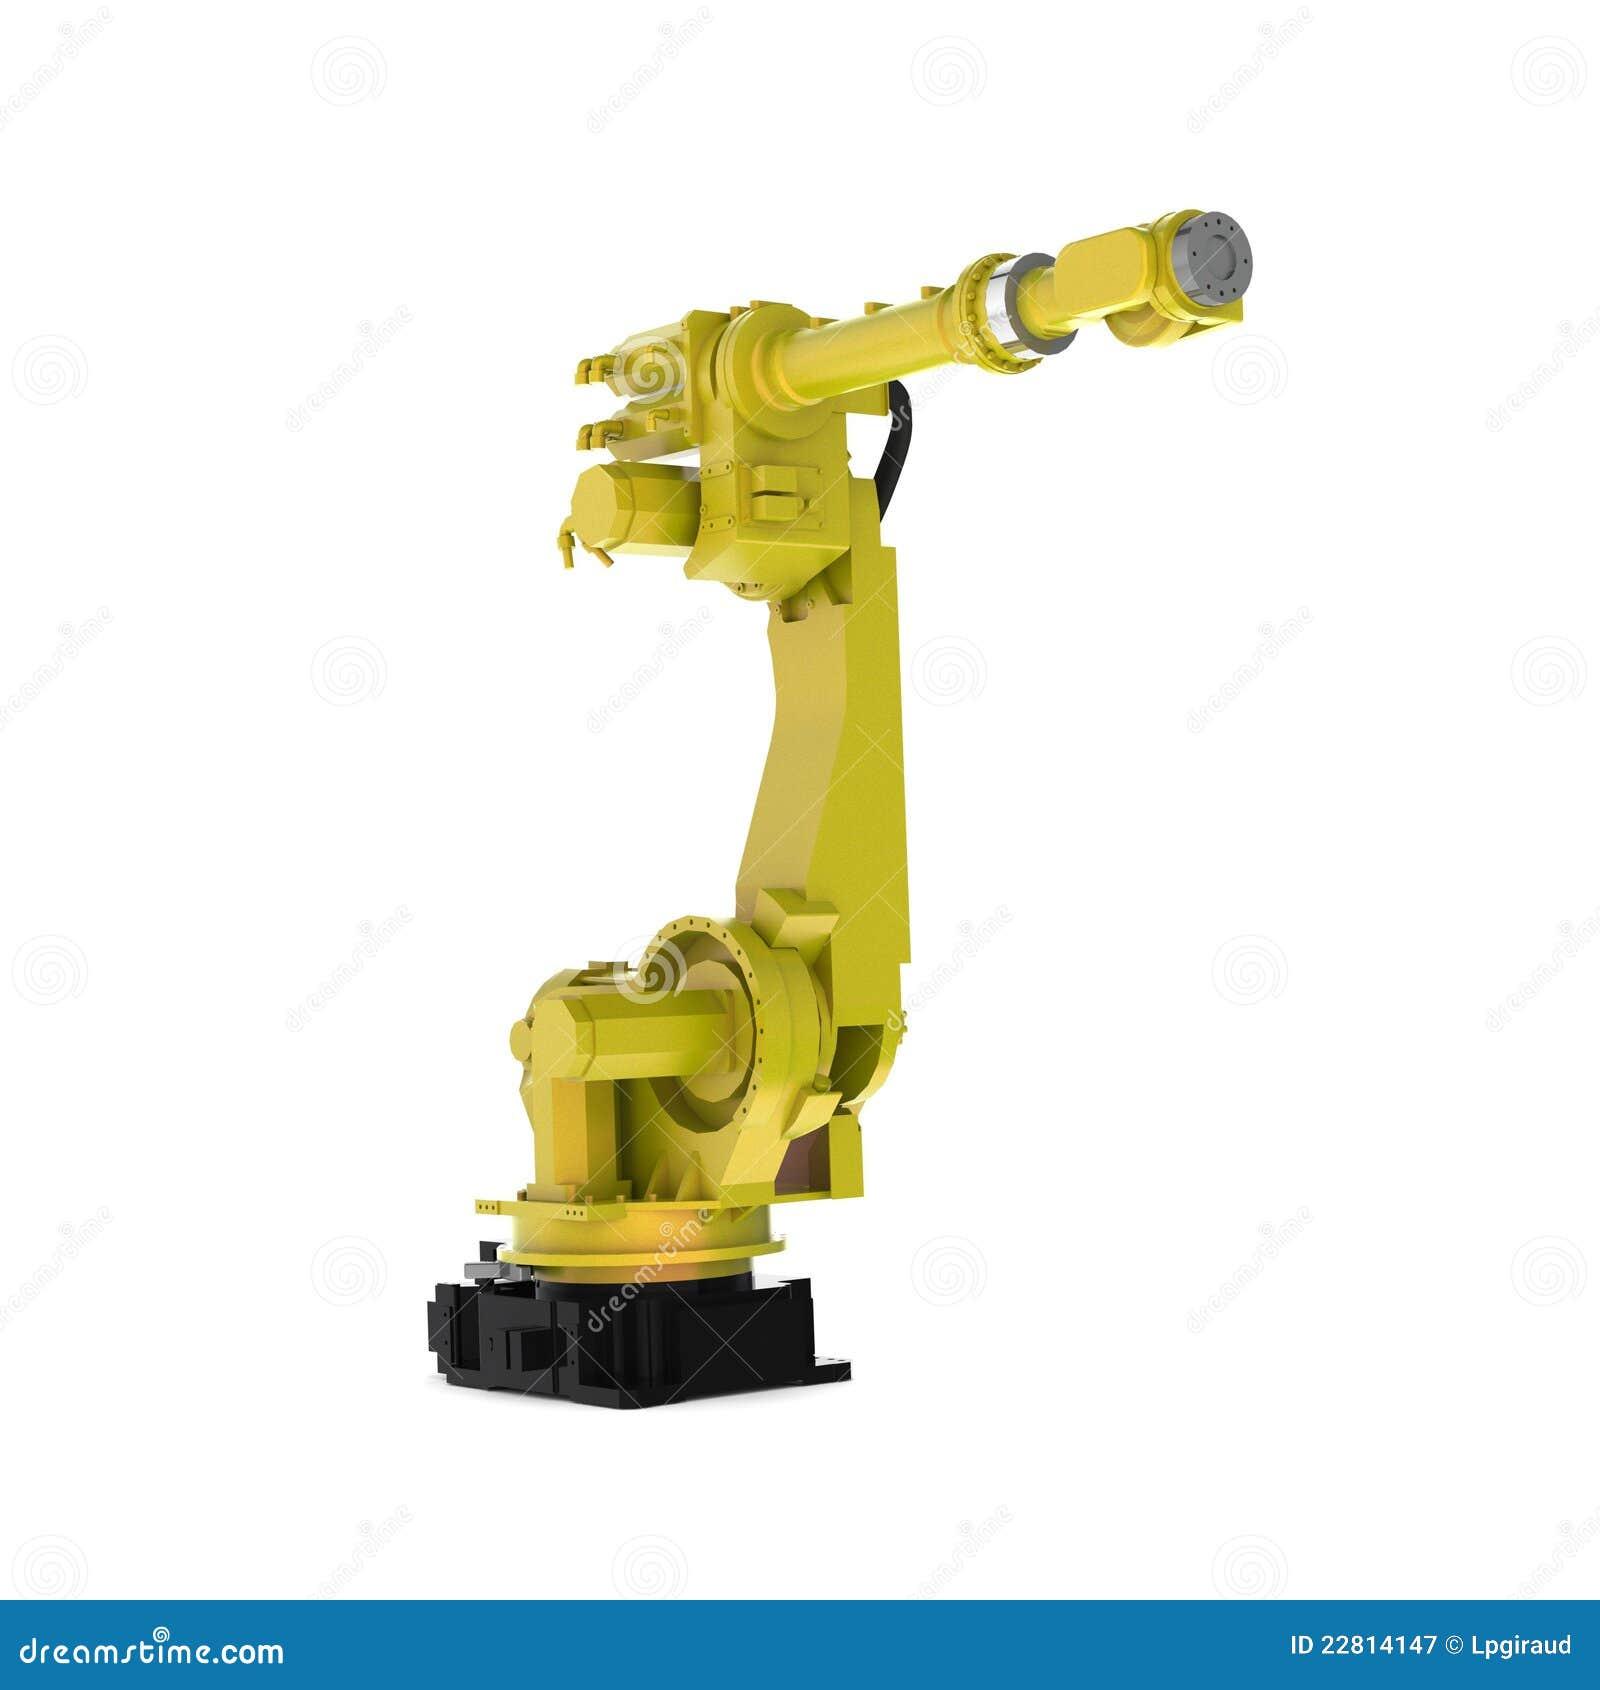 Industrirobotics